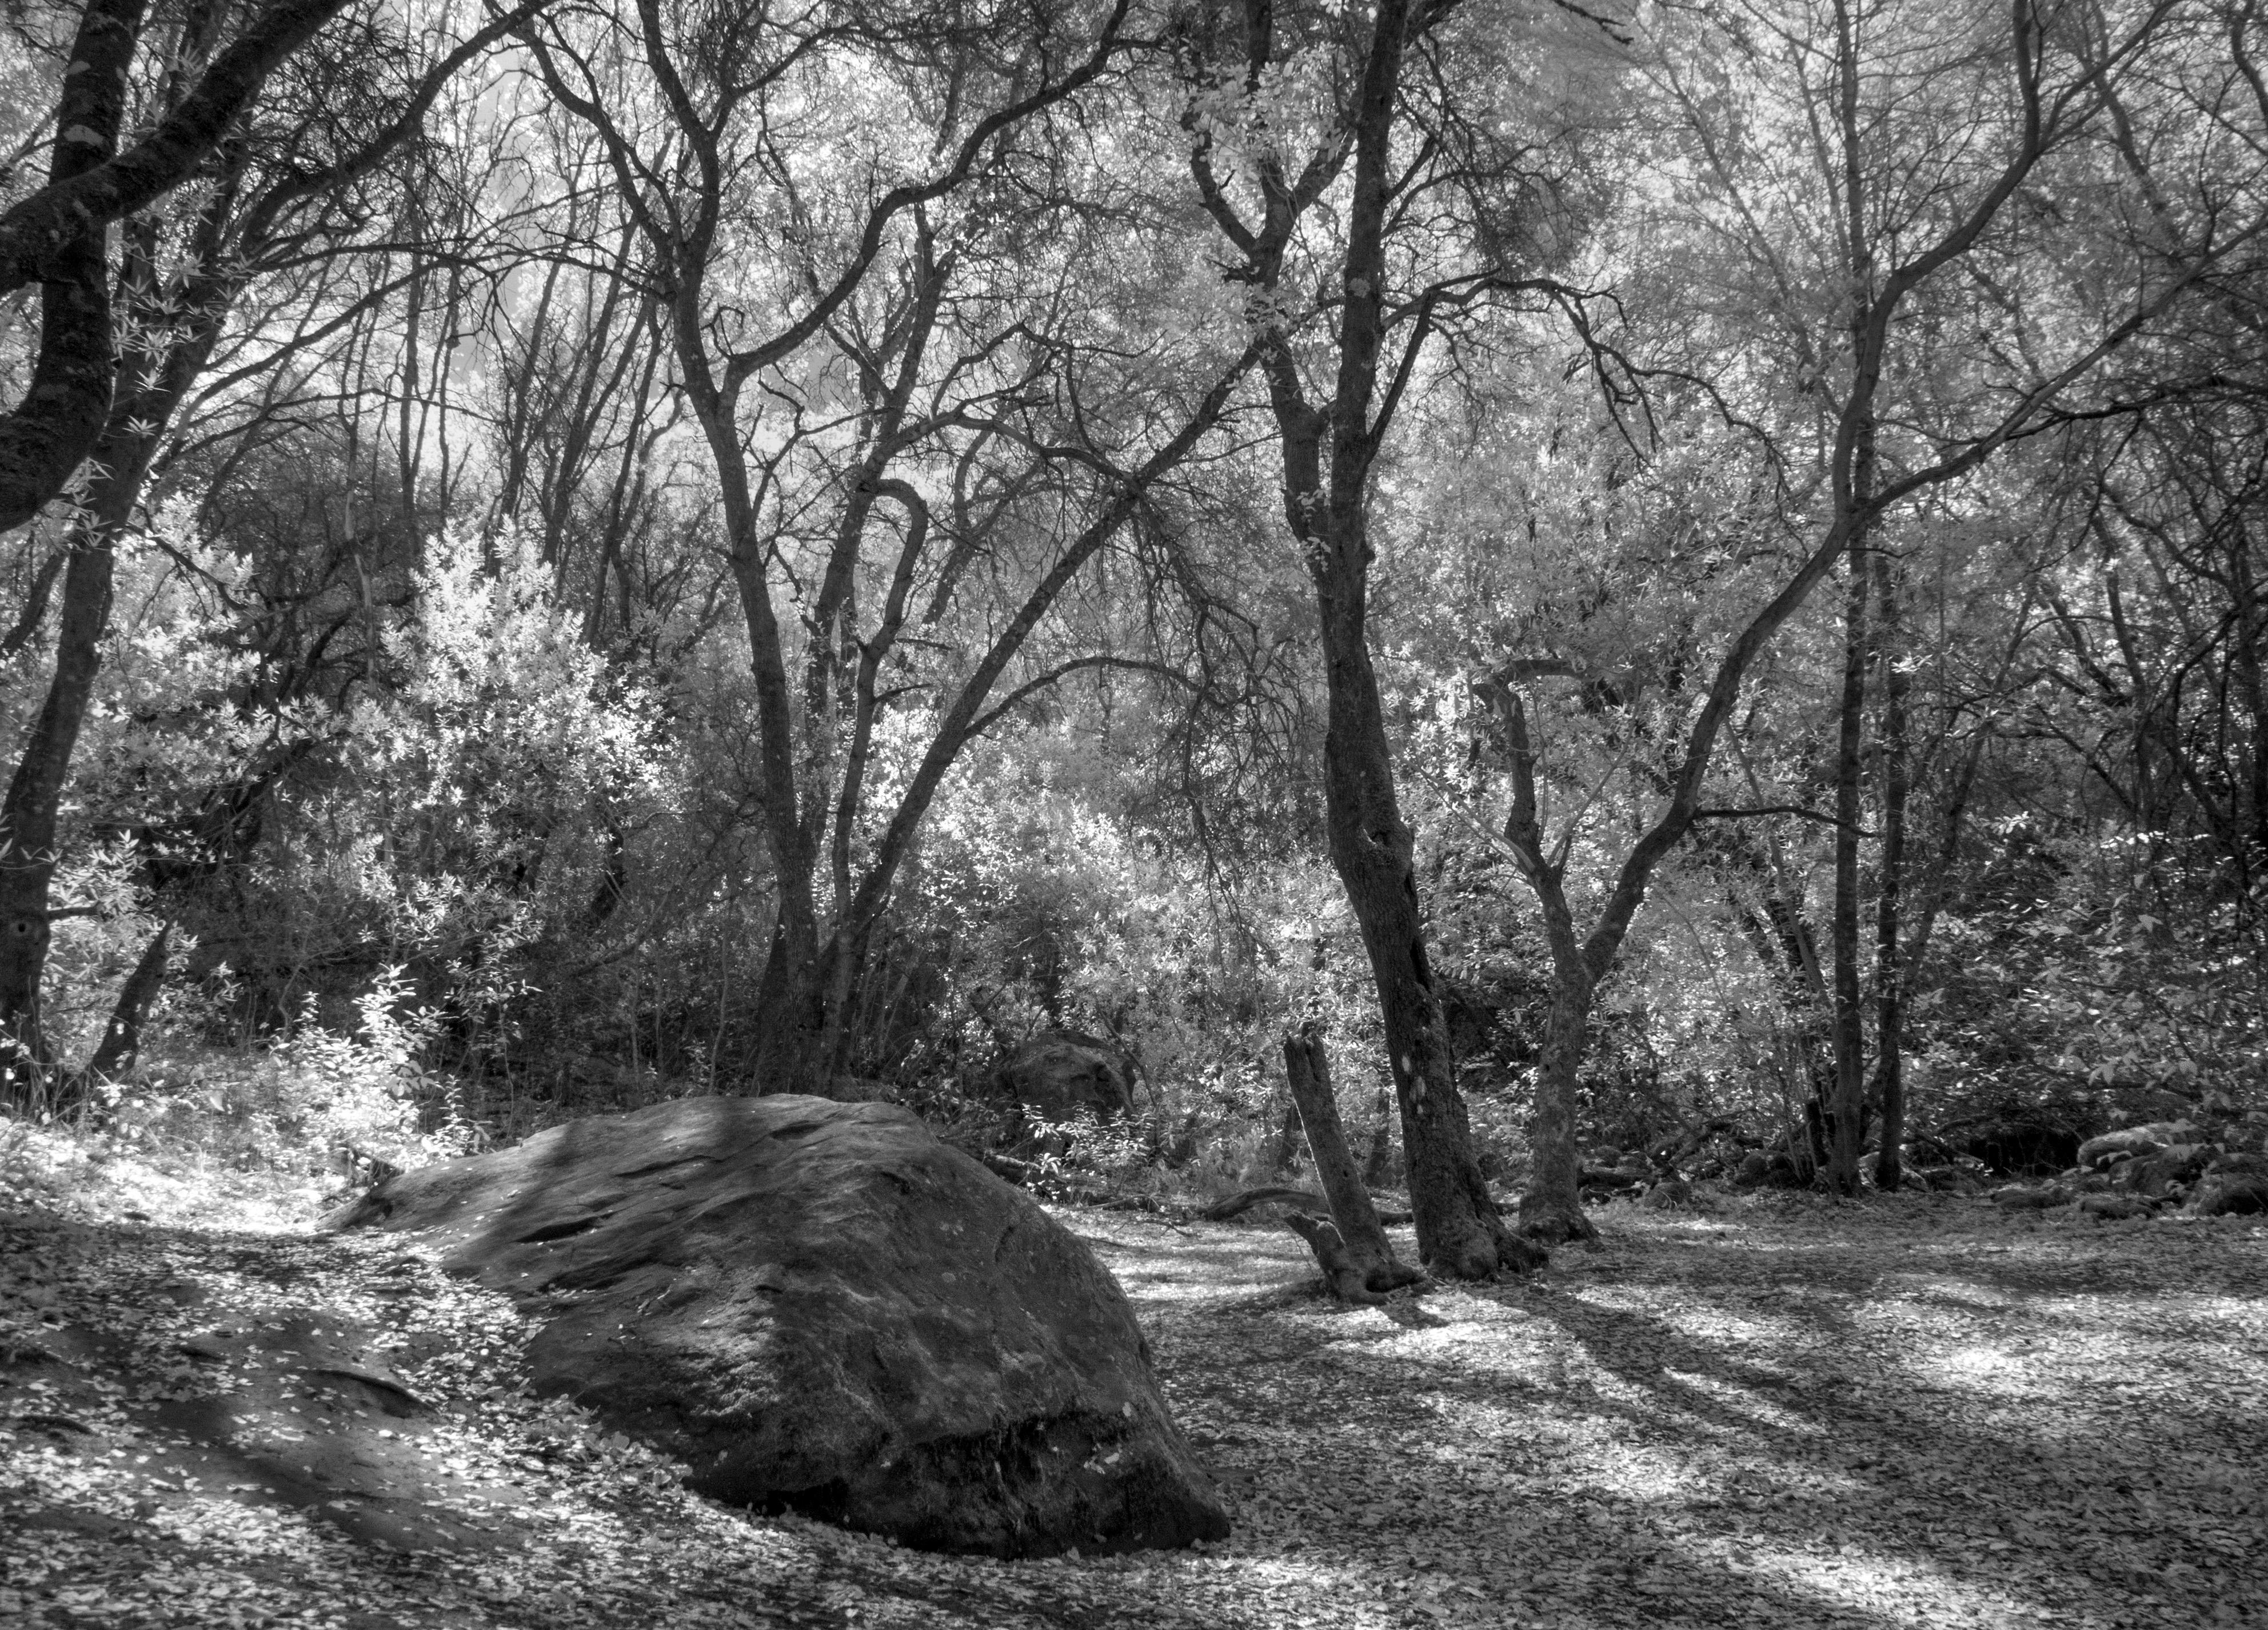 Obrazy : strom, pr\u00edroda, les, divokos\u0165, vetva, zimn\u00e9 ...